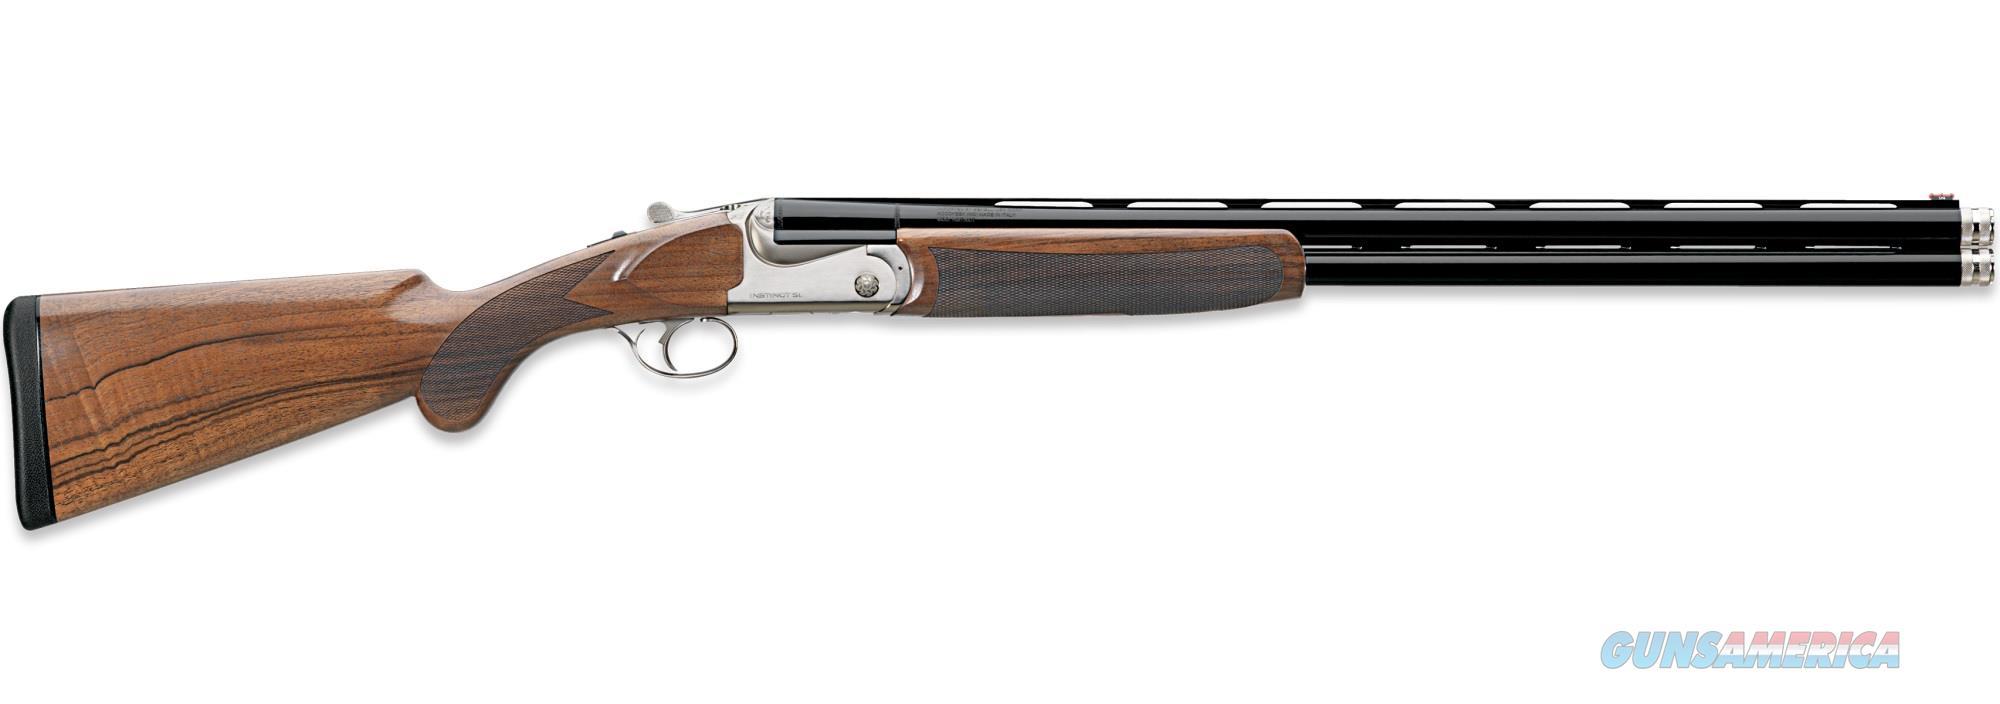 "Franchi Instinct SL 12 Gauge O/U 28"" Walnut 40815   Guns > Shotguns > Franchi Shotguns > Over/Under > Hunting"